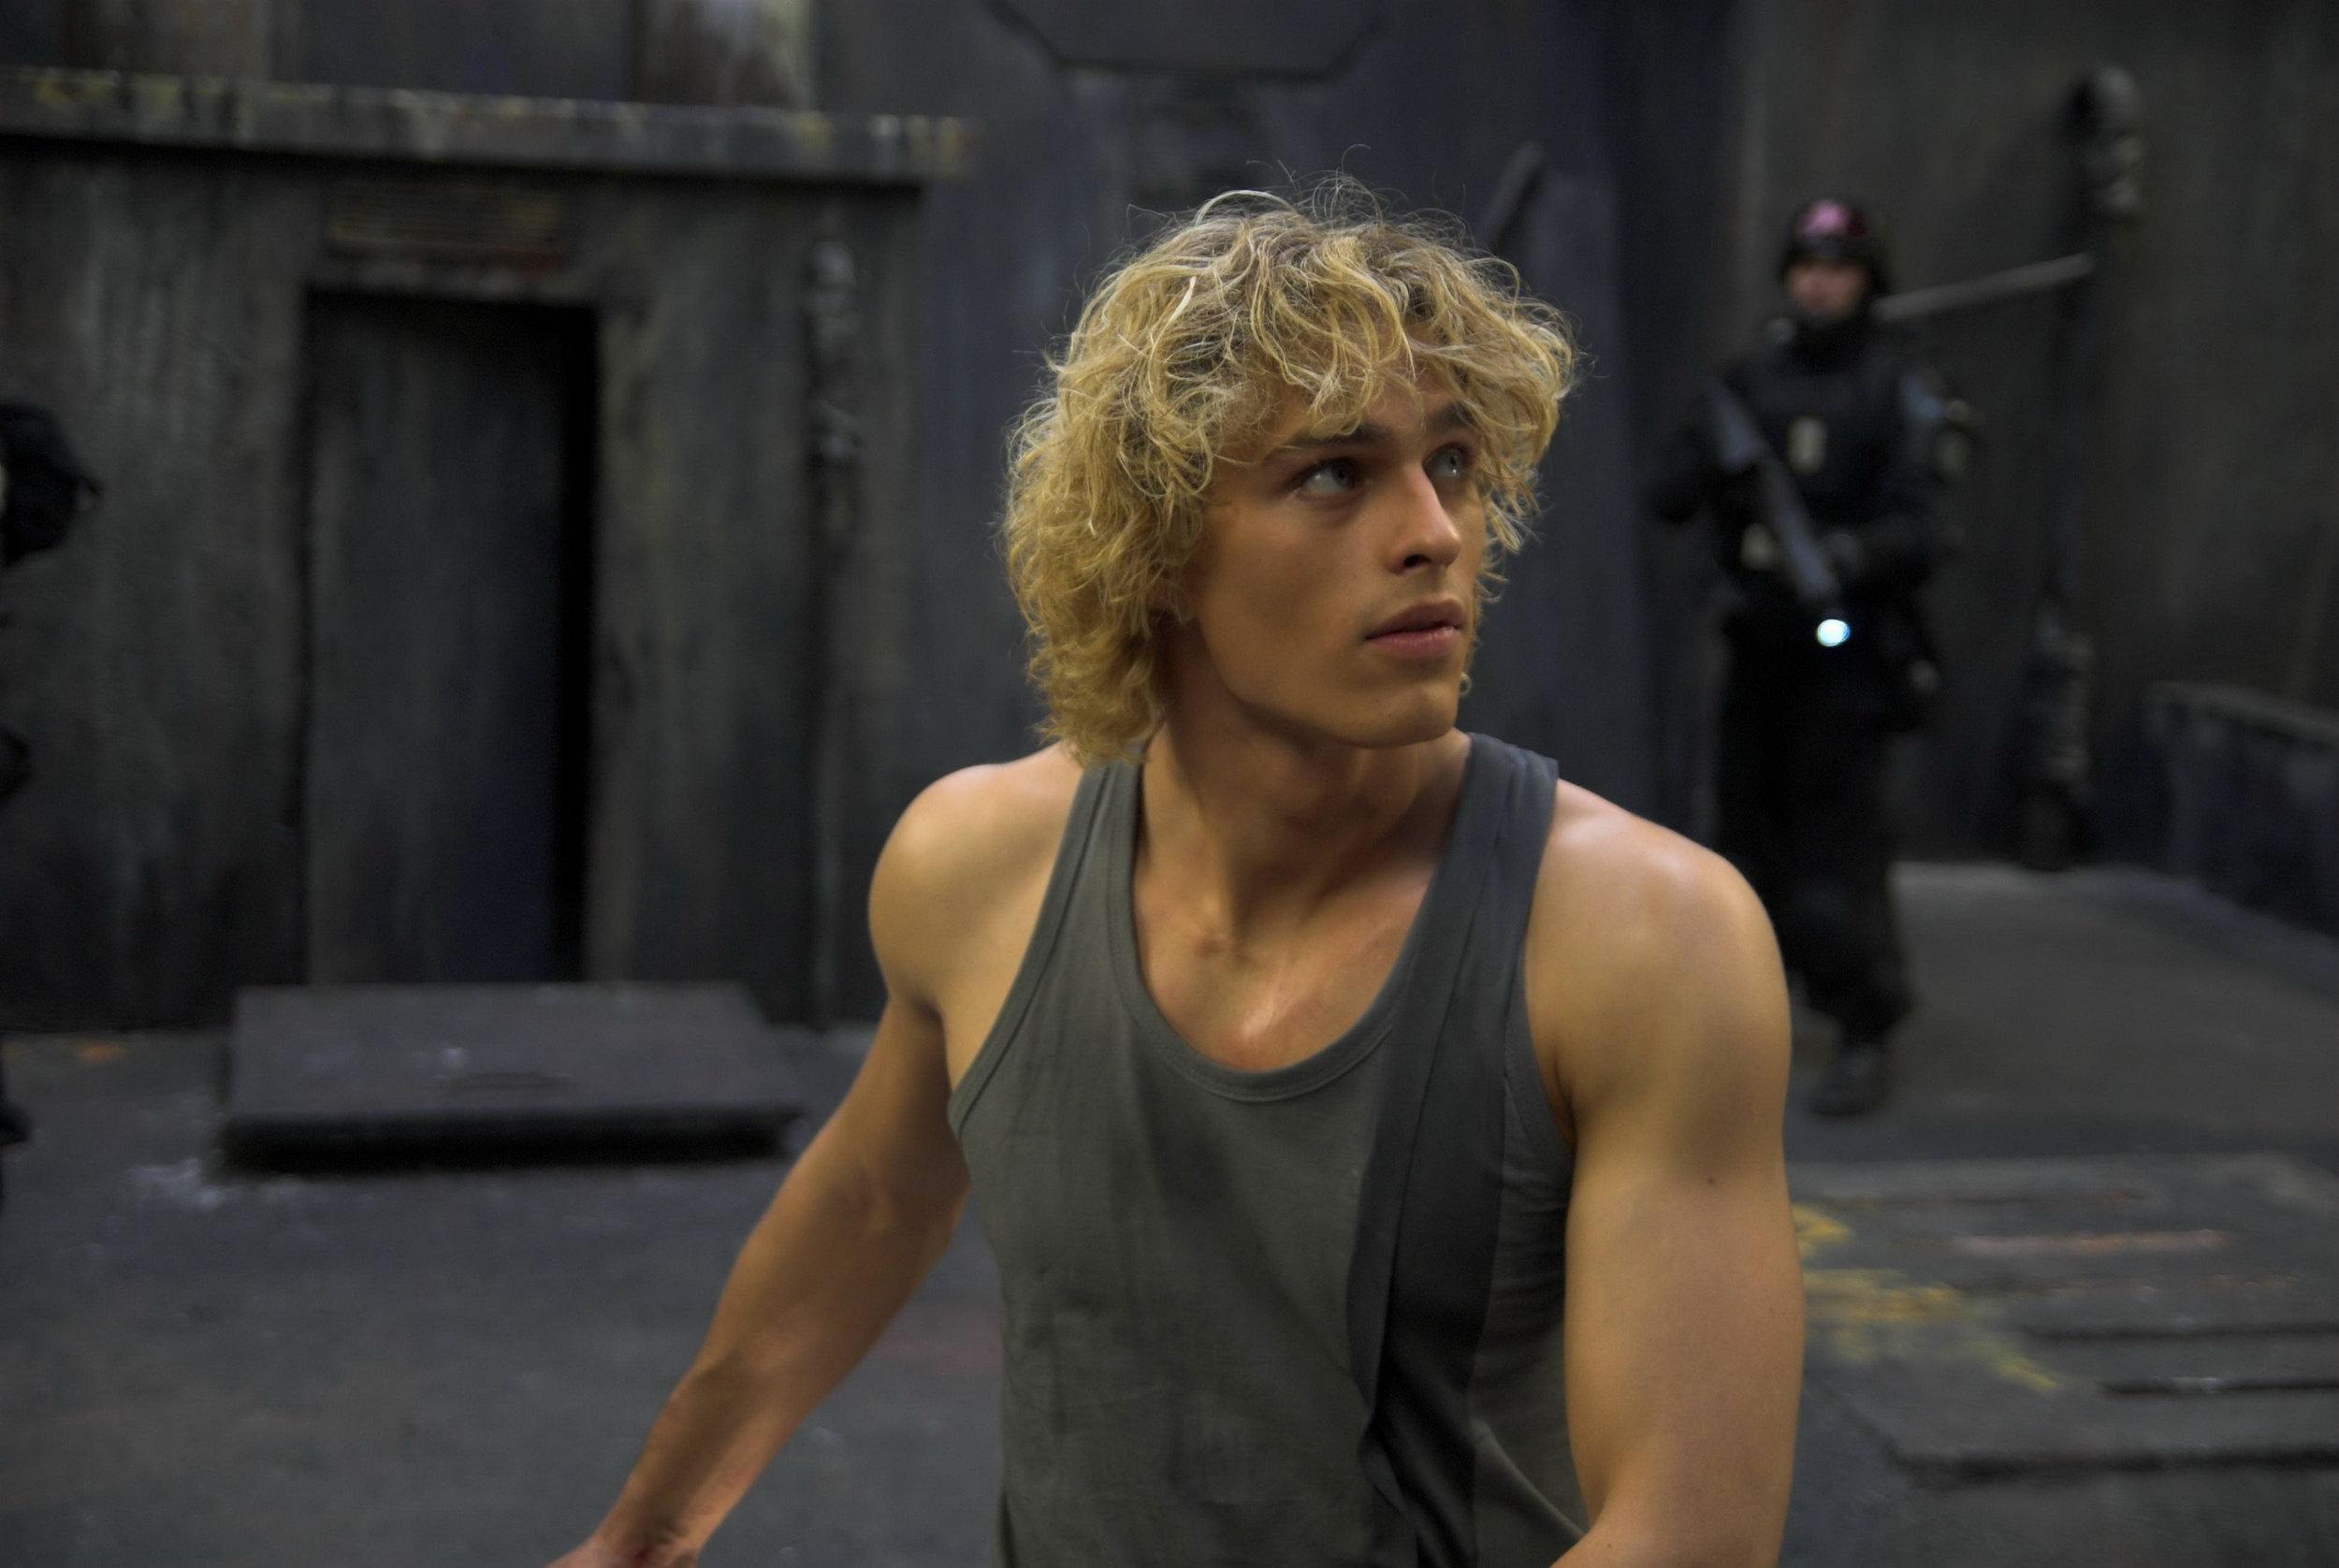 Актер брюнет кудрявый